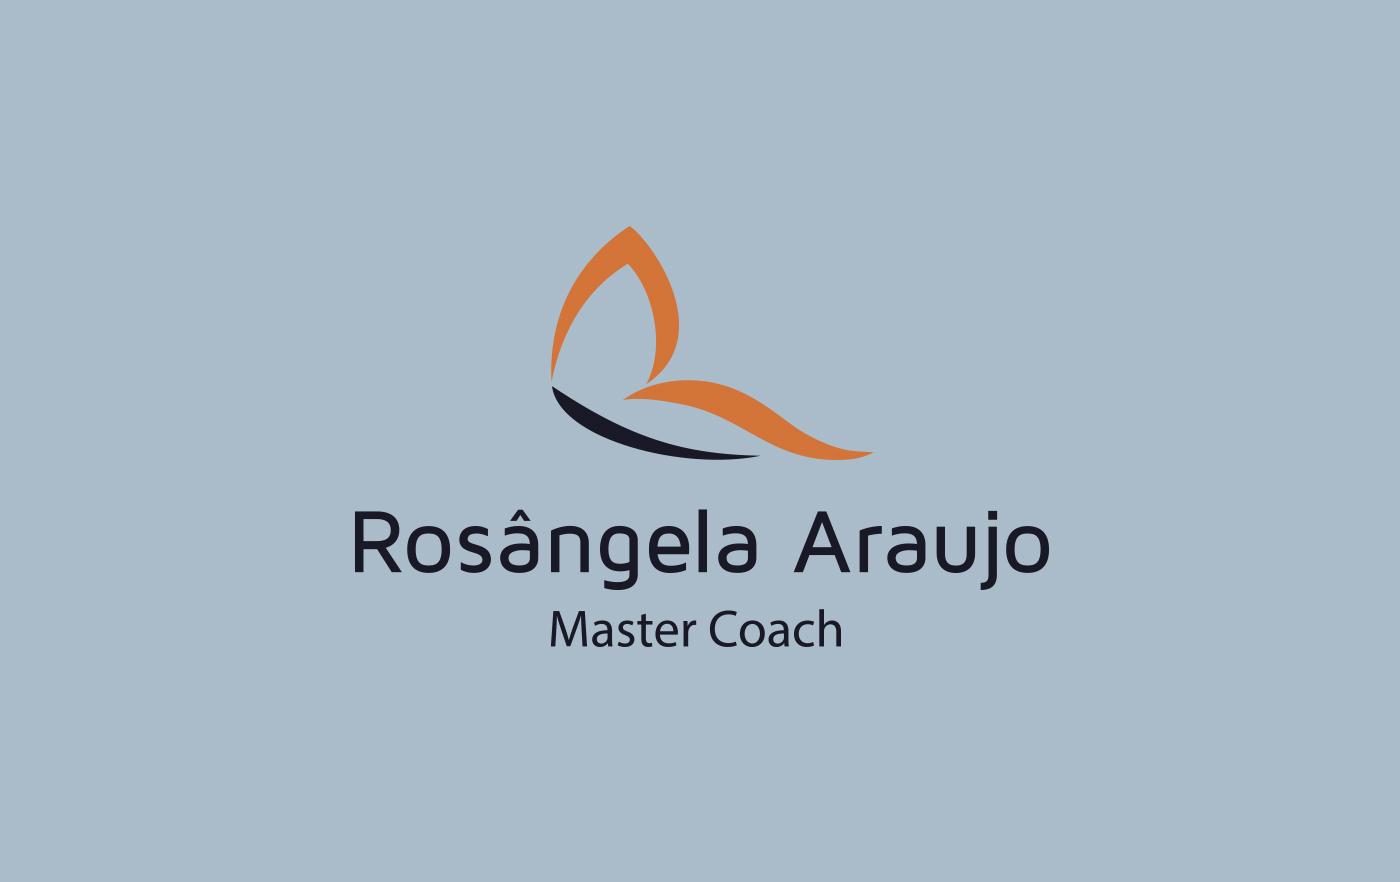 logo Coach coaching parceria Liderança borboleta animal brand butterfly Personal Identity alma transformação metanoia metamorfose mark